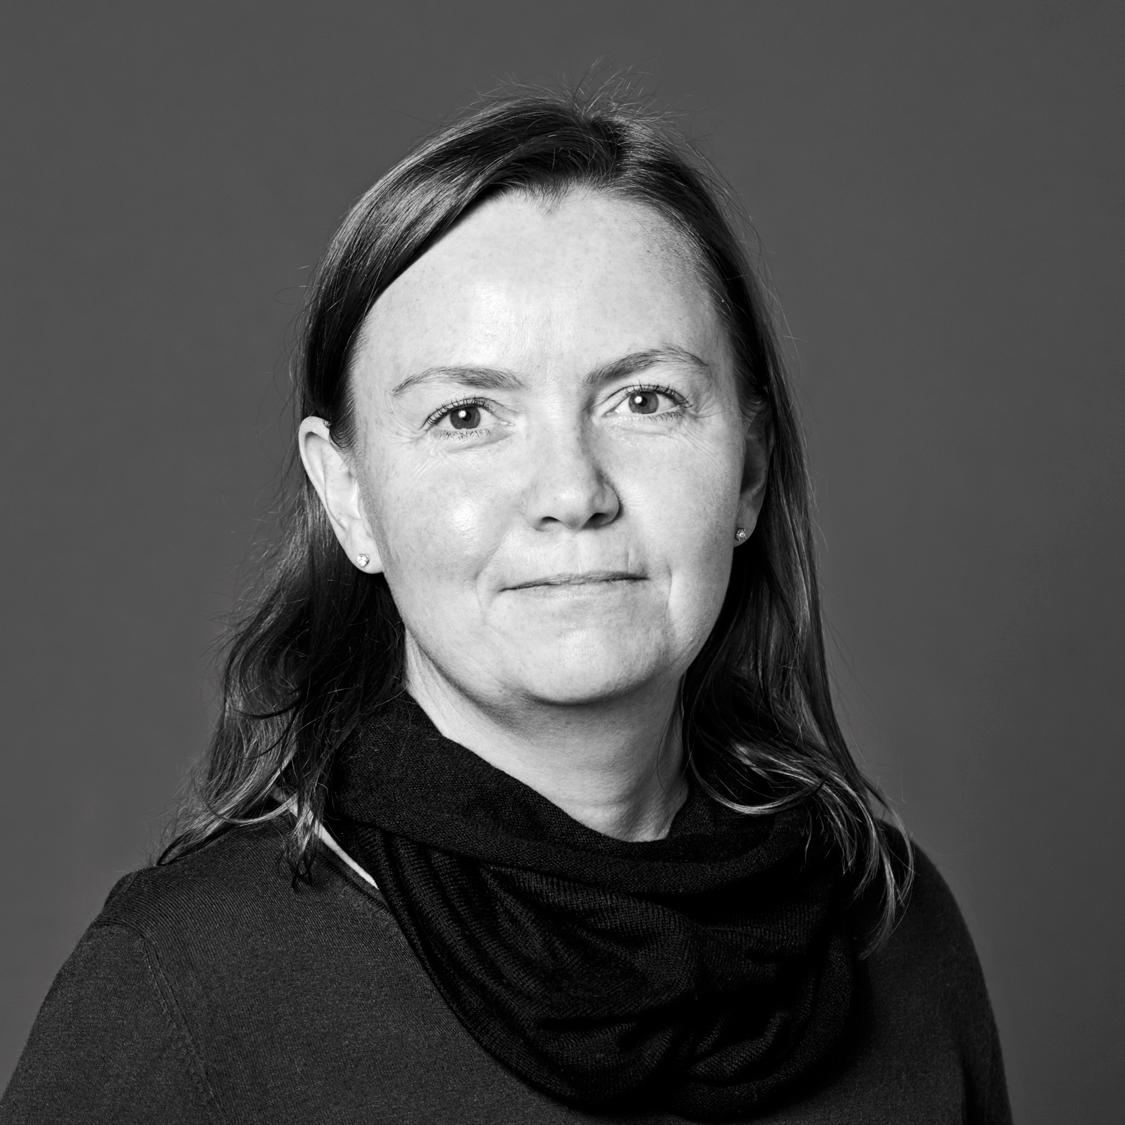 Linda Marie Venbakken